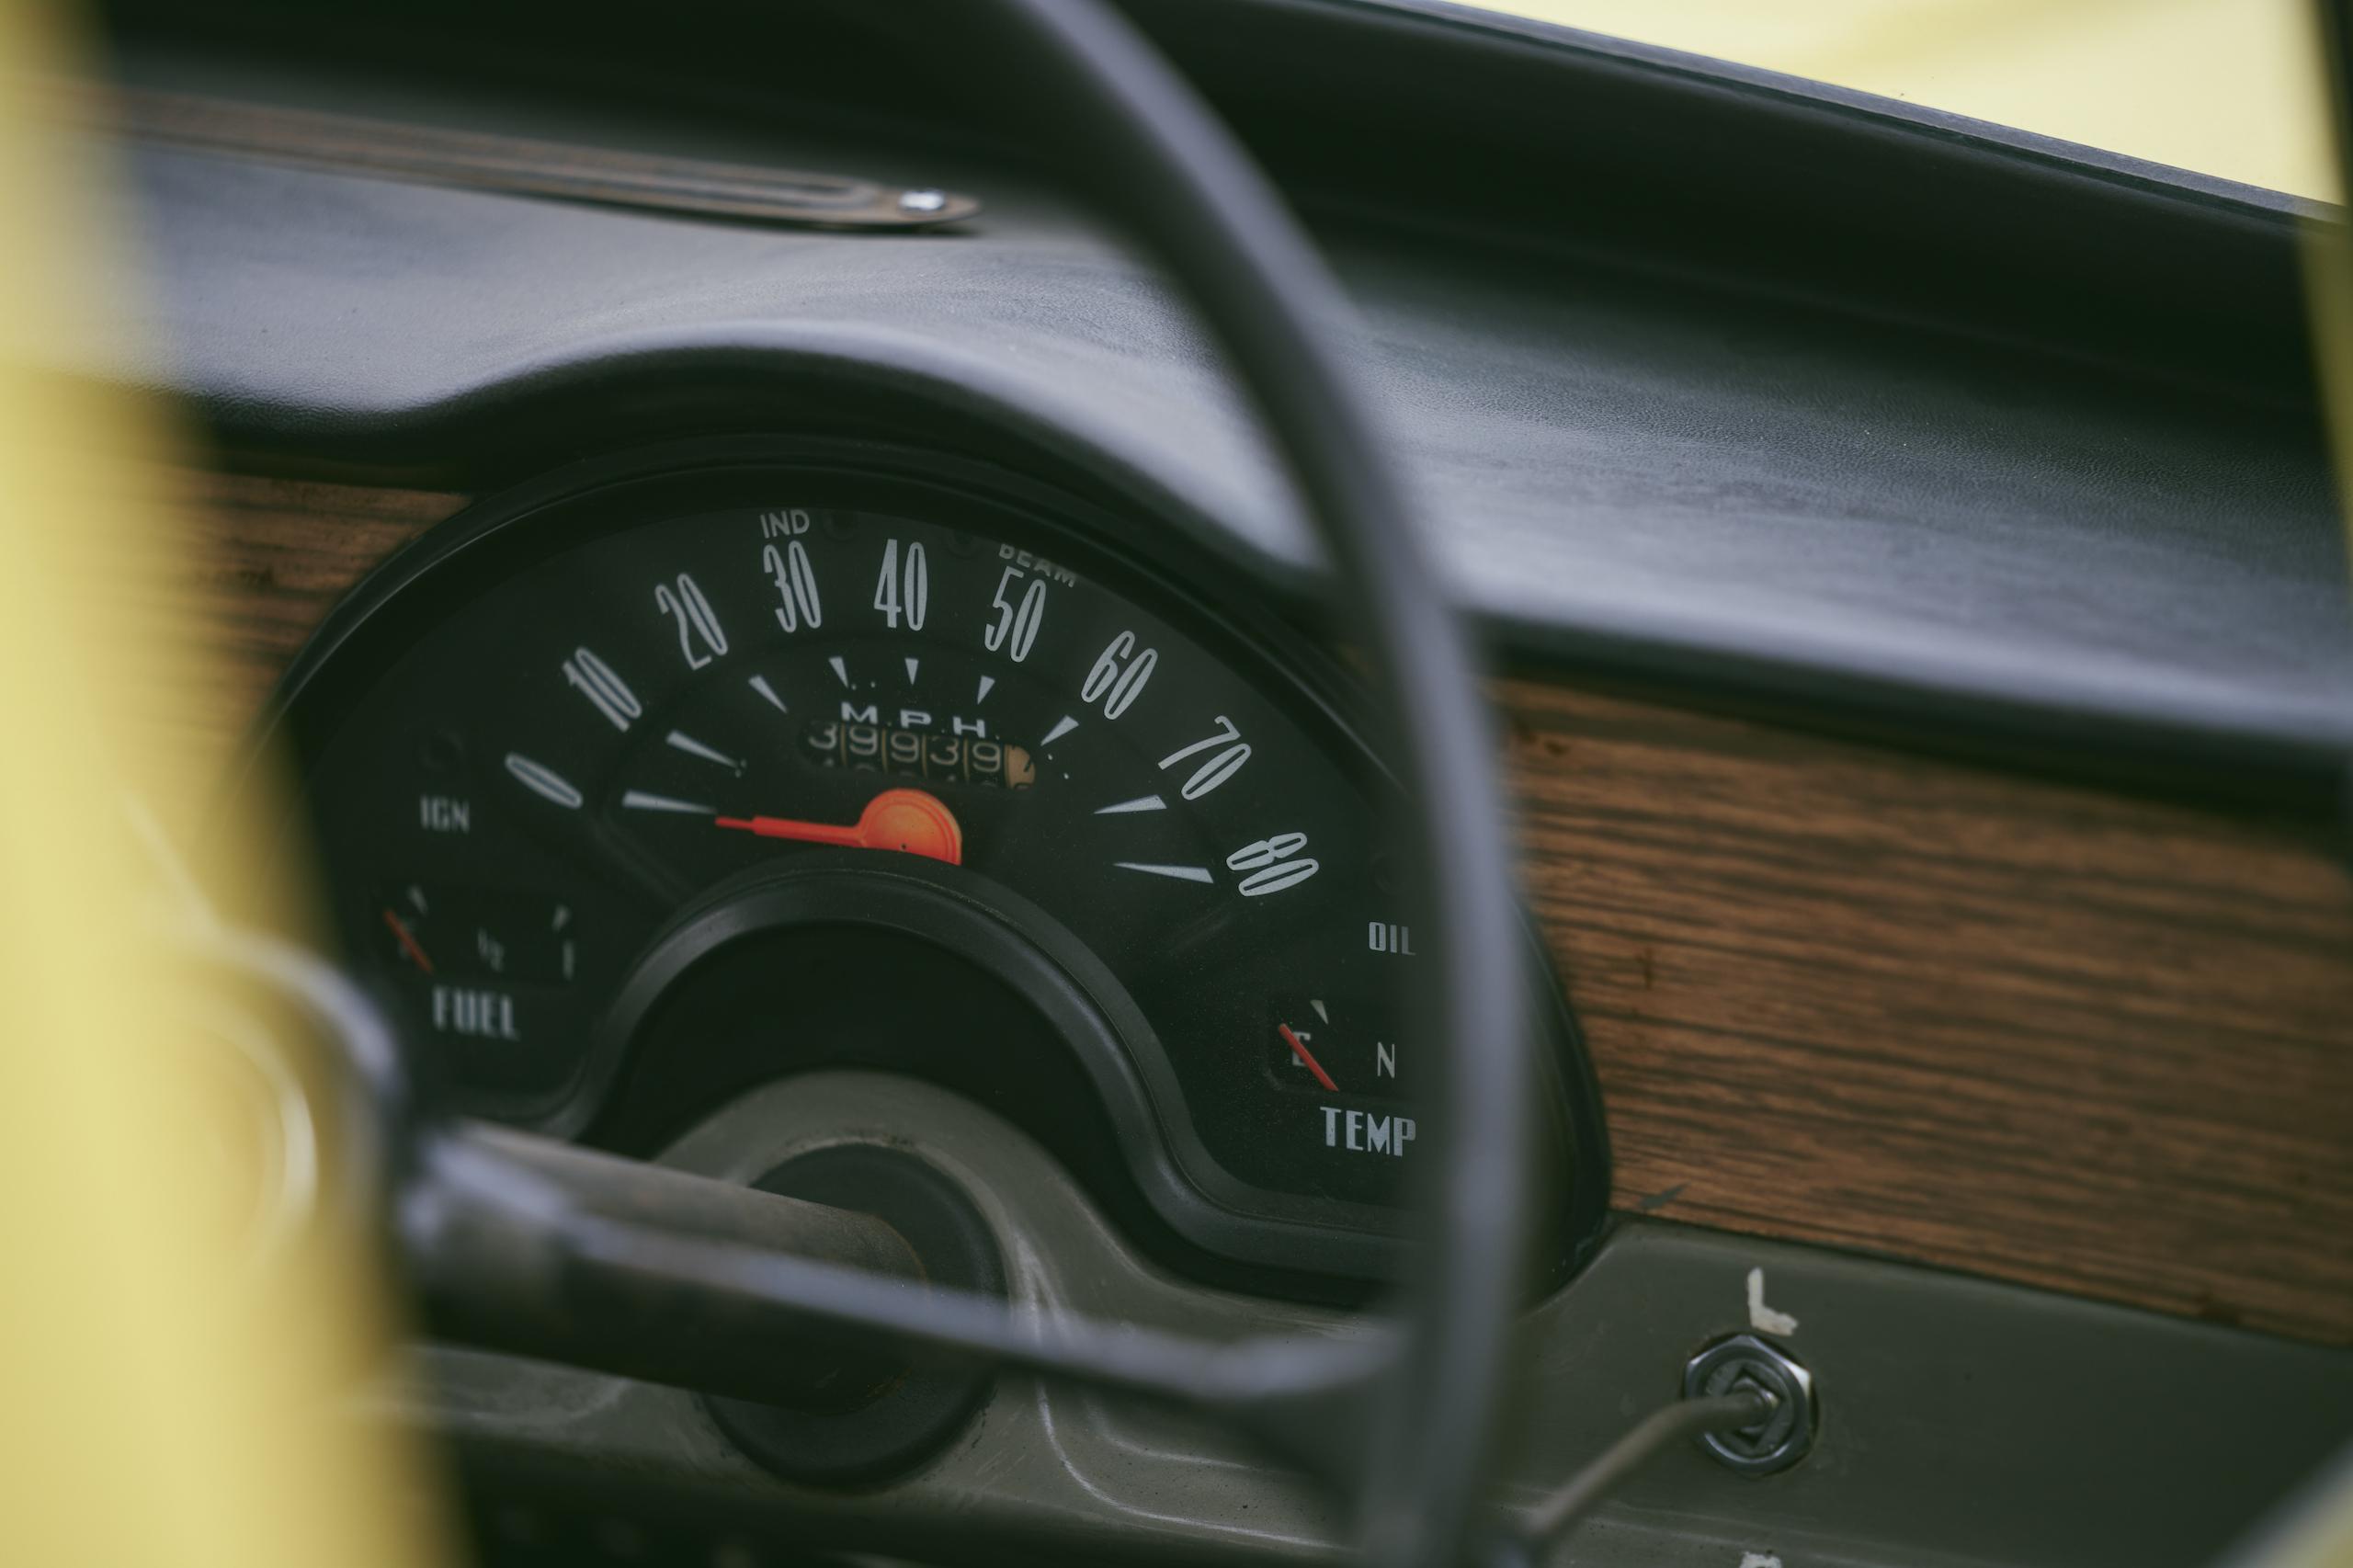 1971 Reliant Regal 330 interior speedo gauge detail